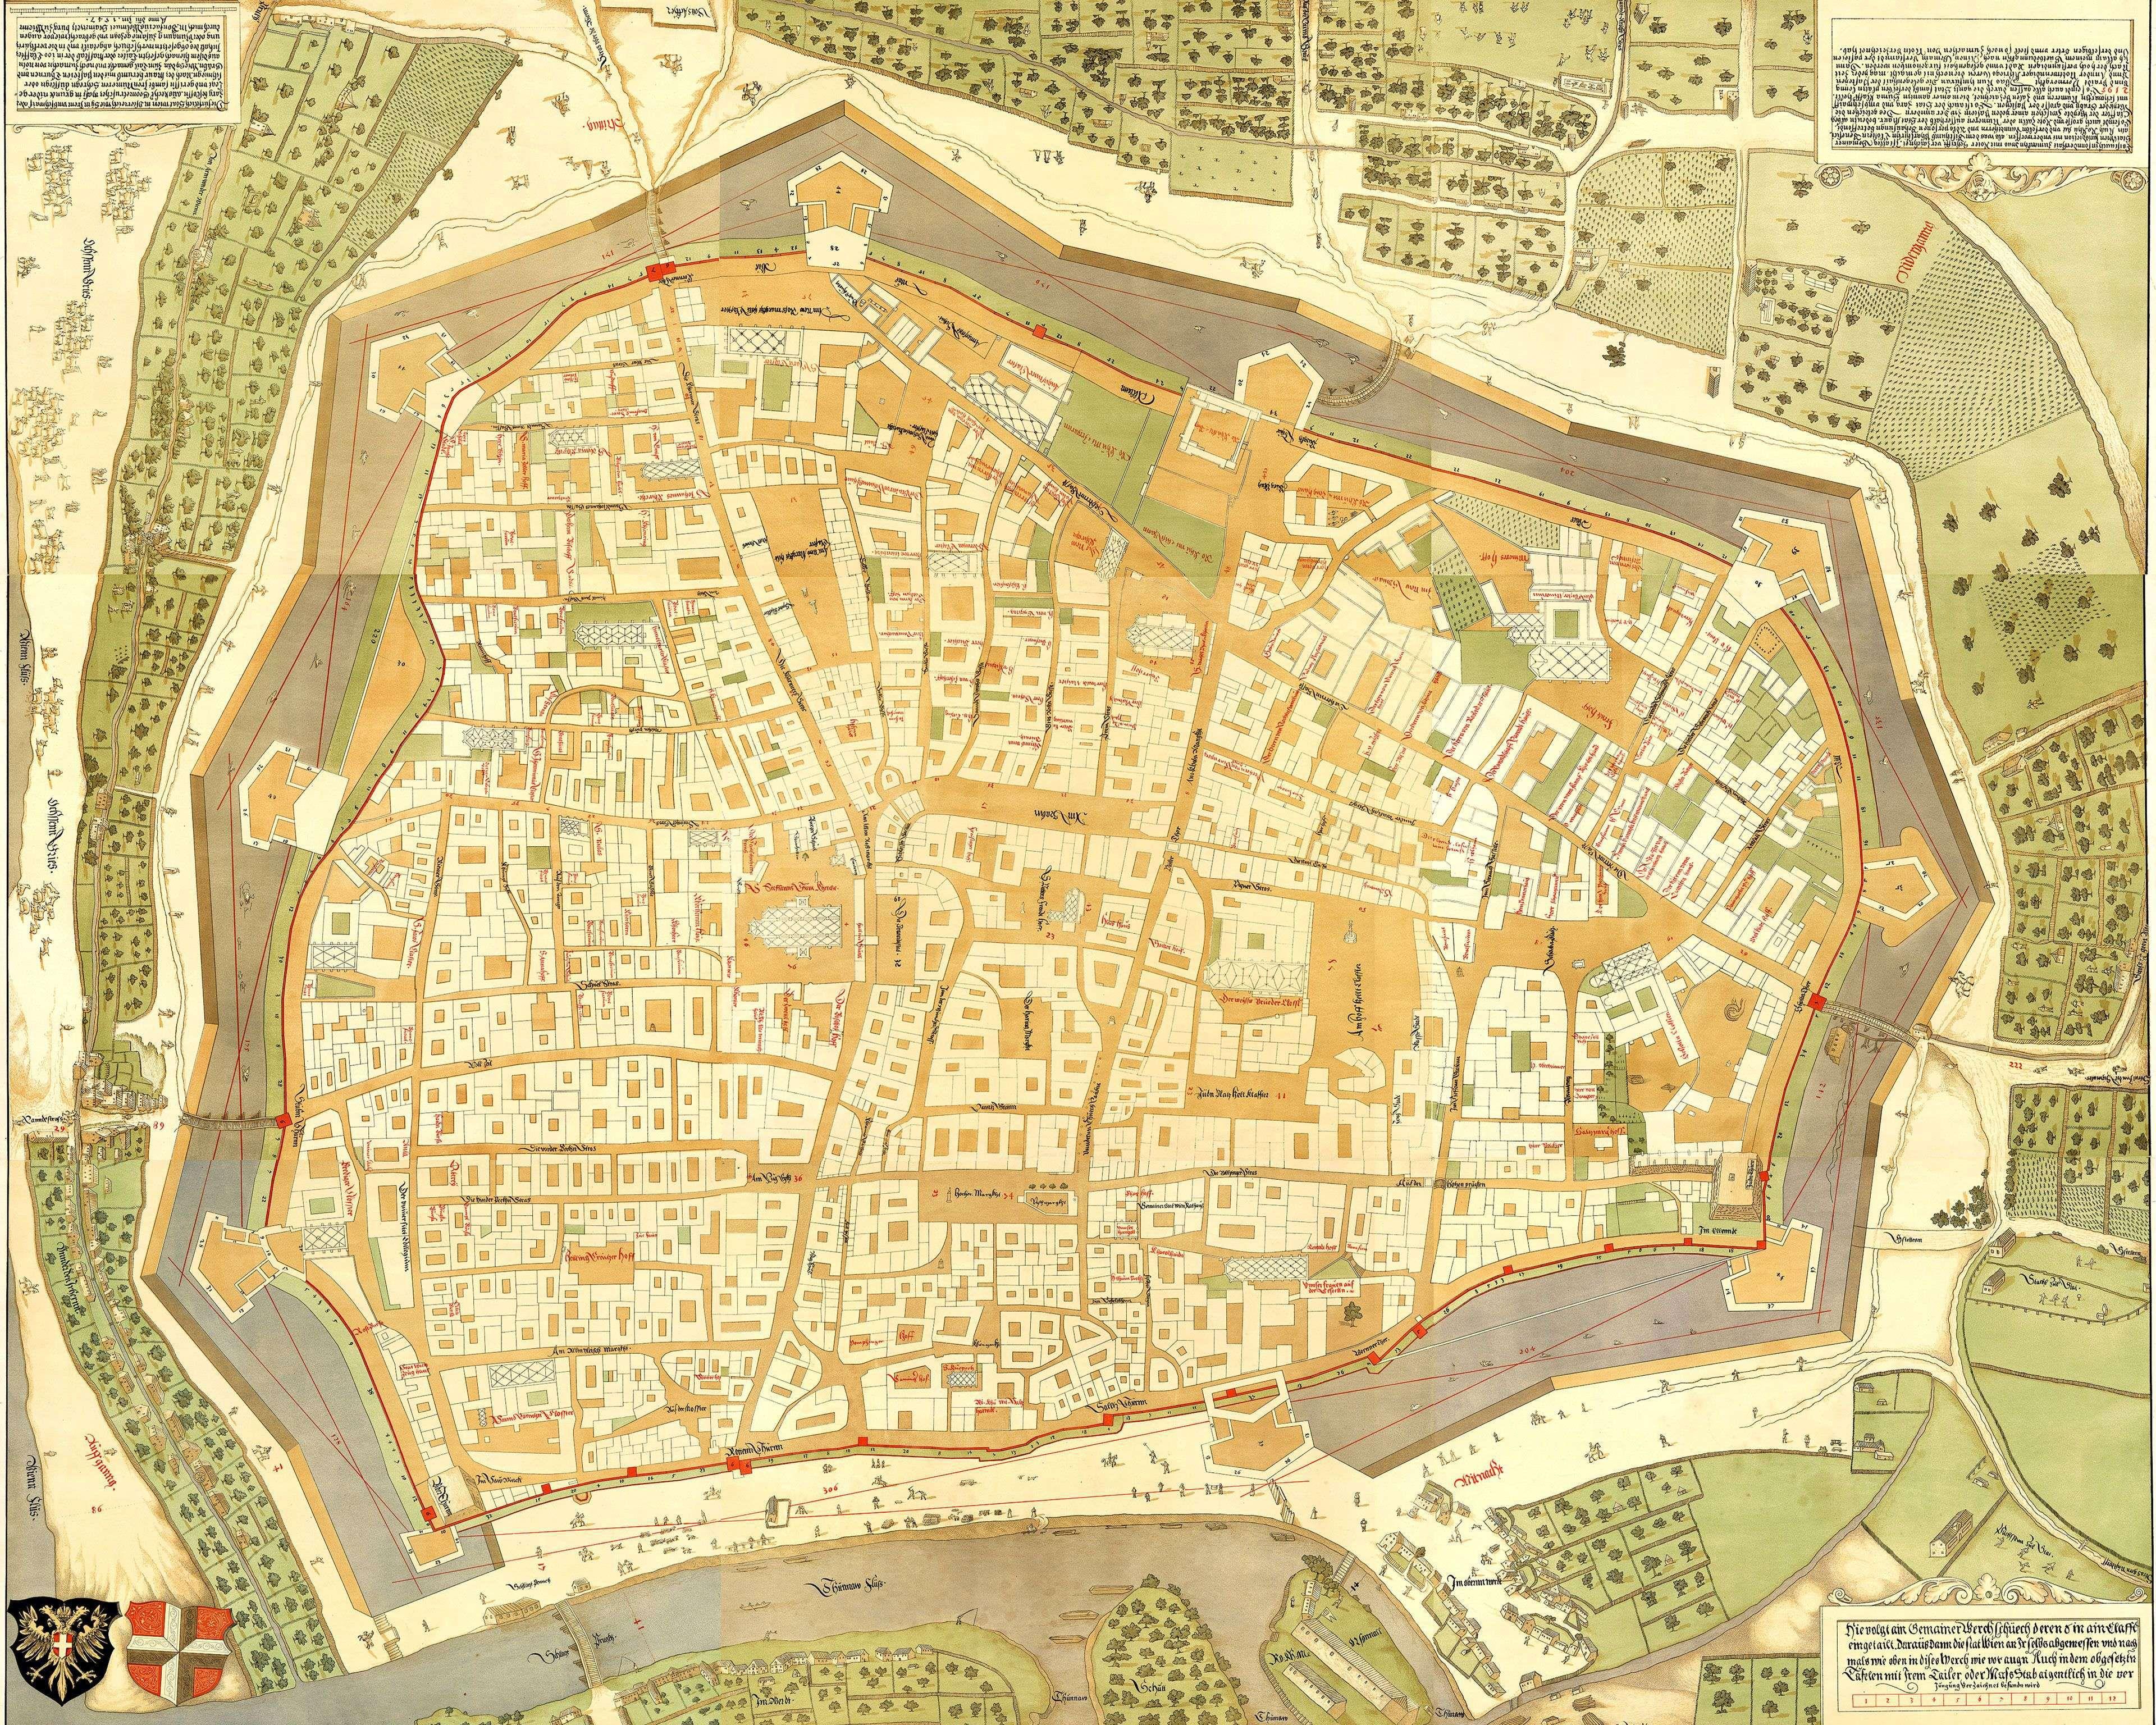 Plano de Viena de 1547 MAPAS PLANOS HISTRICOS Pinterest